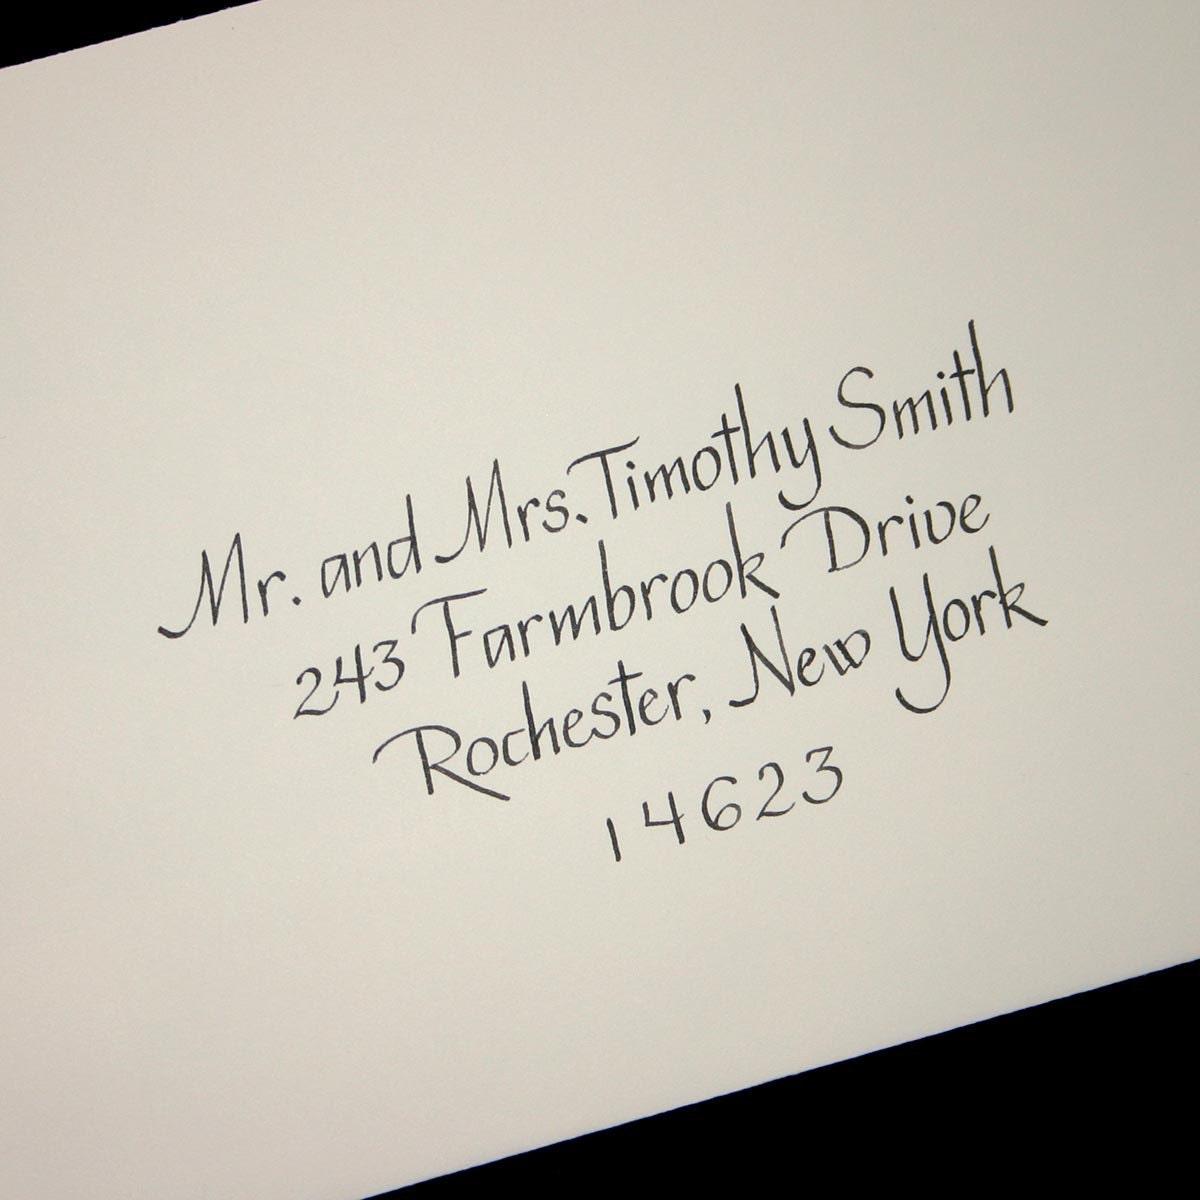 Calligraphy envelope addressing service wedding